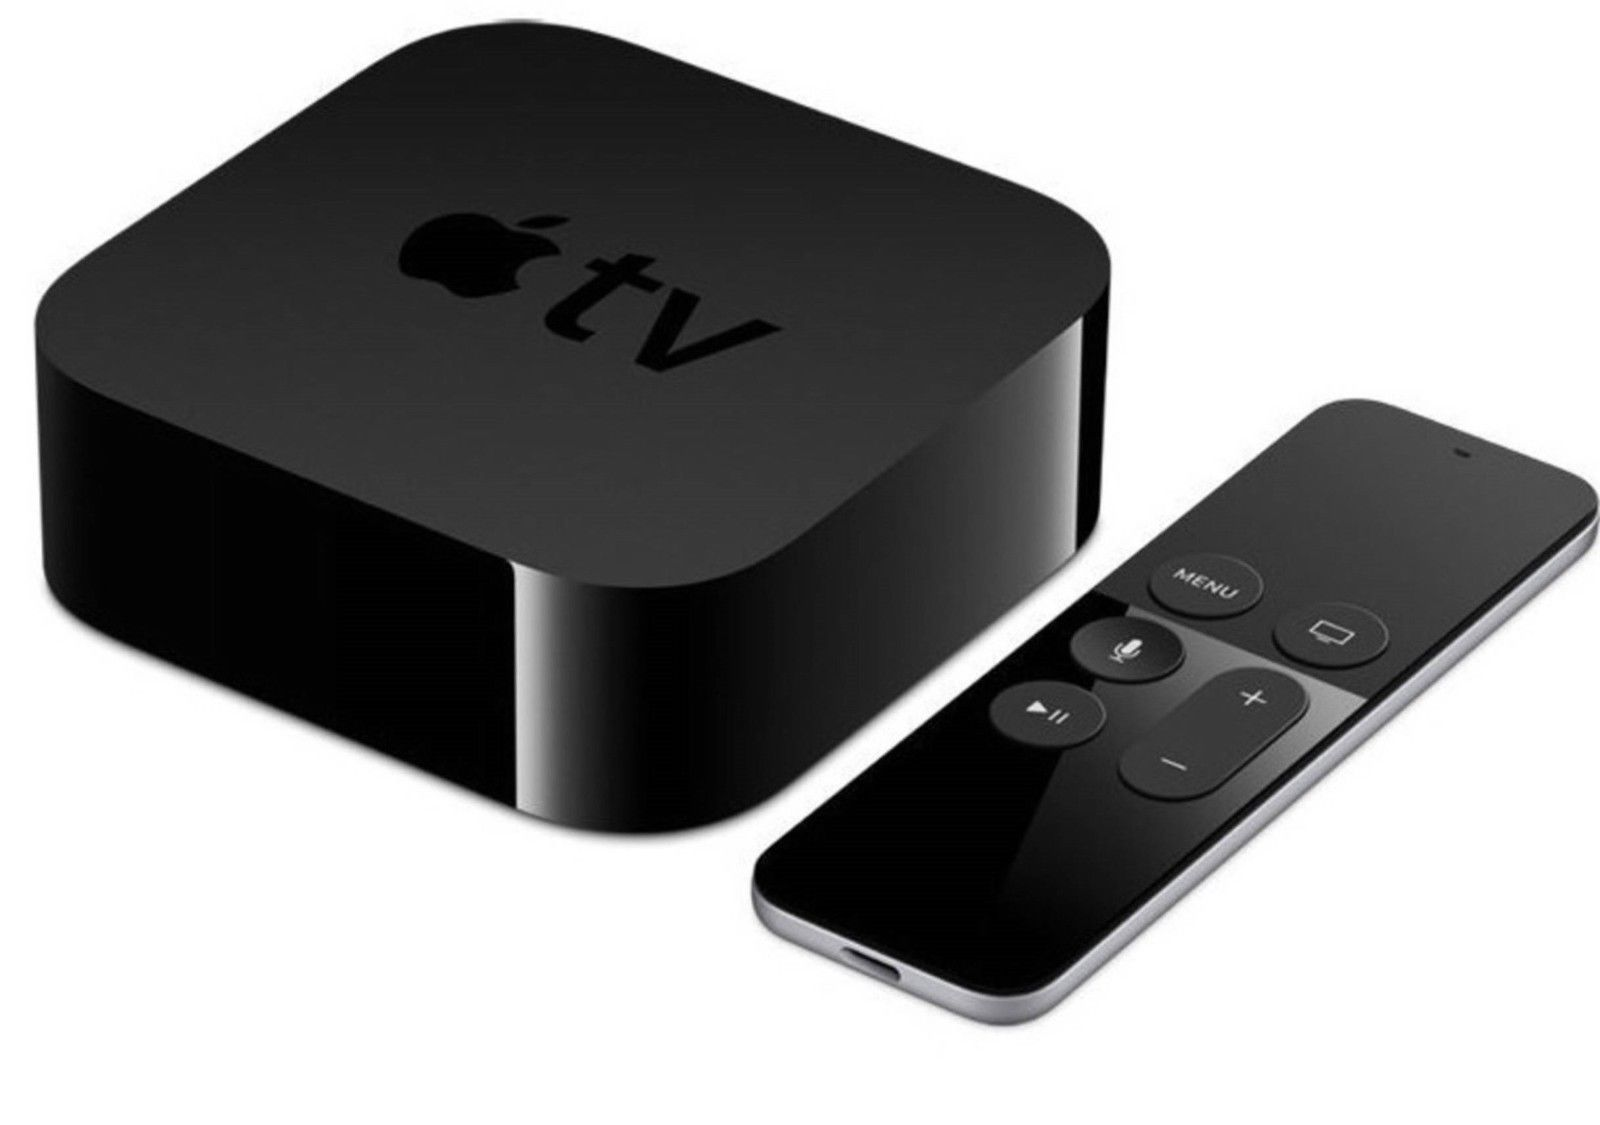 139 99 Apple Tv 4th Generation 64gb Digital Hd Media Streamer Apple Generation 64gb Digital Media Streamer Videogames And Apple Tv Apple 64gb